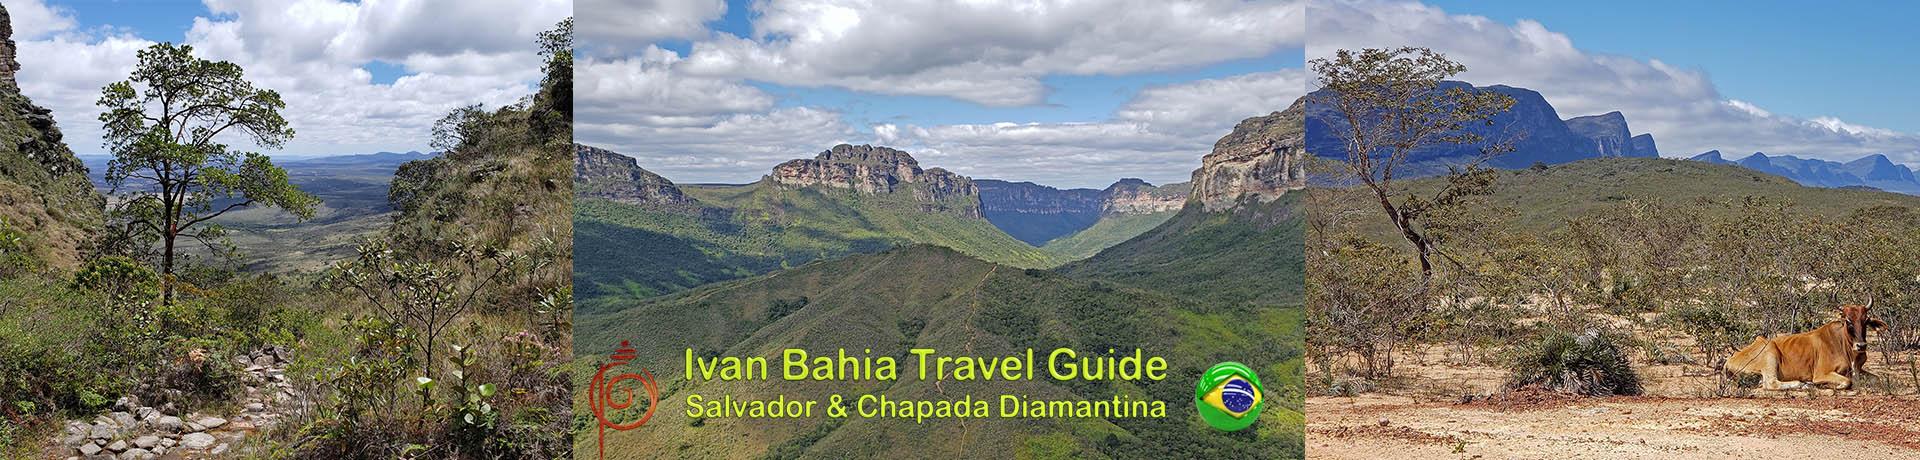 Ivan Bahia Nederlandstalig reis gids privé reis Salvador & nationaal park Chapada Diamantina (ook bekend als de 'Grand Canyon van Brazilië') - reizen met een Vlaming - hashtag #ibtg #ibg #ivanbahiaguide #ivanbahiatravelguide #zenturturismo #ivanchapadadiamantinaguide #valedopati #patyvalley #pati #viapati #valecapao #ivanchapadaguide #chapadadiamantinatransfer #chapadatrekking #chapadaroots #chapadasoul #lencoisbahia #chapadadiamantinatrekking #ivanchapadadiamantinaguide  #chapadadiamantinaguide  #lencois #lençois #chapadaadventuredaniel #diamondmountains #zentur #chapadaaventure #discoverchapada #chapadadiamond #chapadasoul #diamantinatrip #tripadvisor #ivanbahia #salvadorbahiaTravel #toursbylocals #fotosbahia #bahiafotos #chapadadiamantinanationalpark #yourtoursbrazil #maurotours #bahiatopturismo #bahiapremium #fernandobingretourguide #cassiturismo